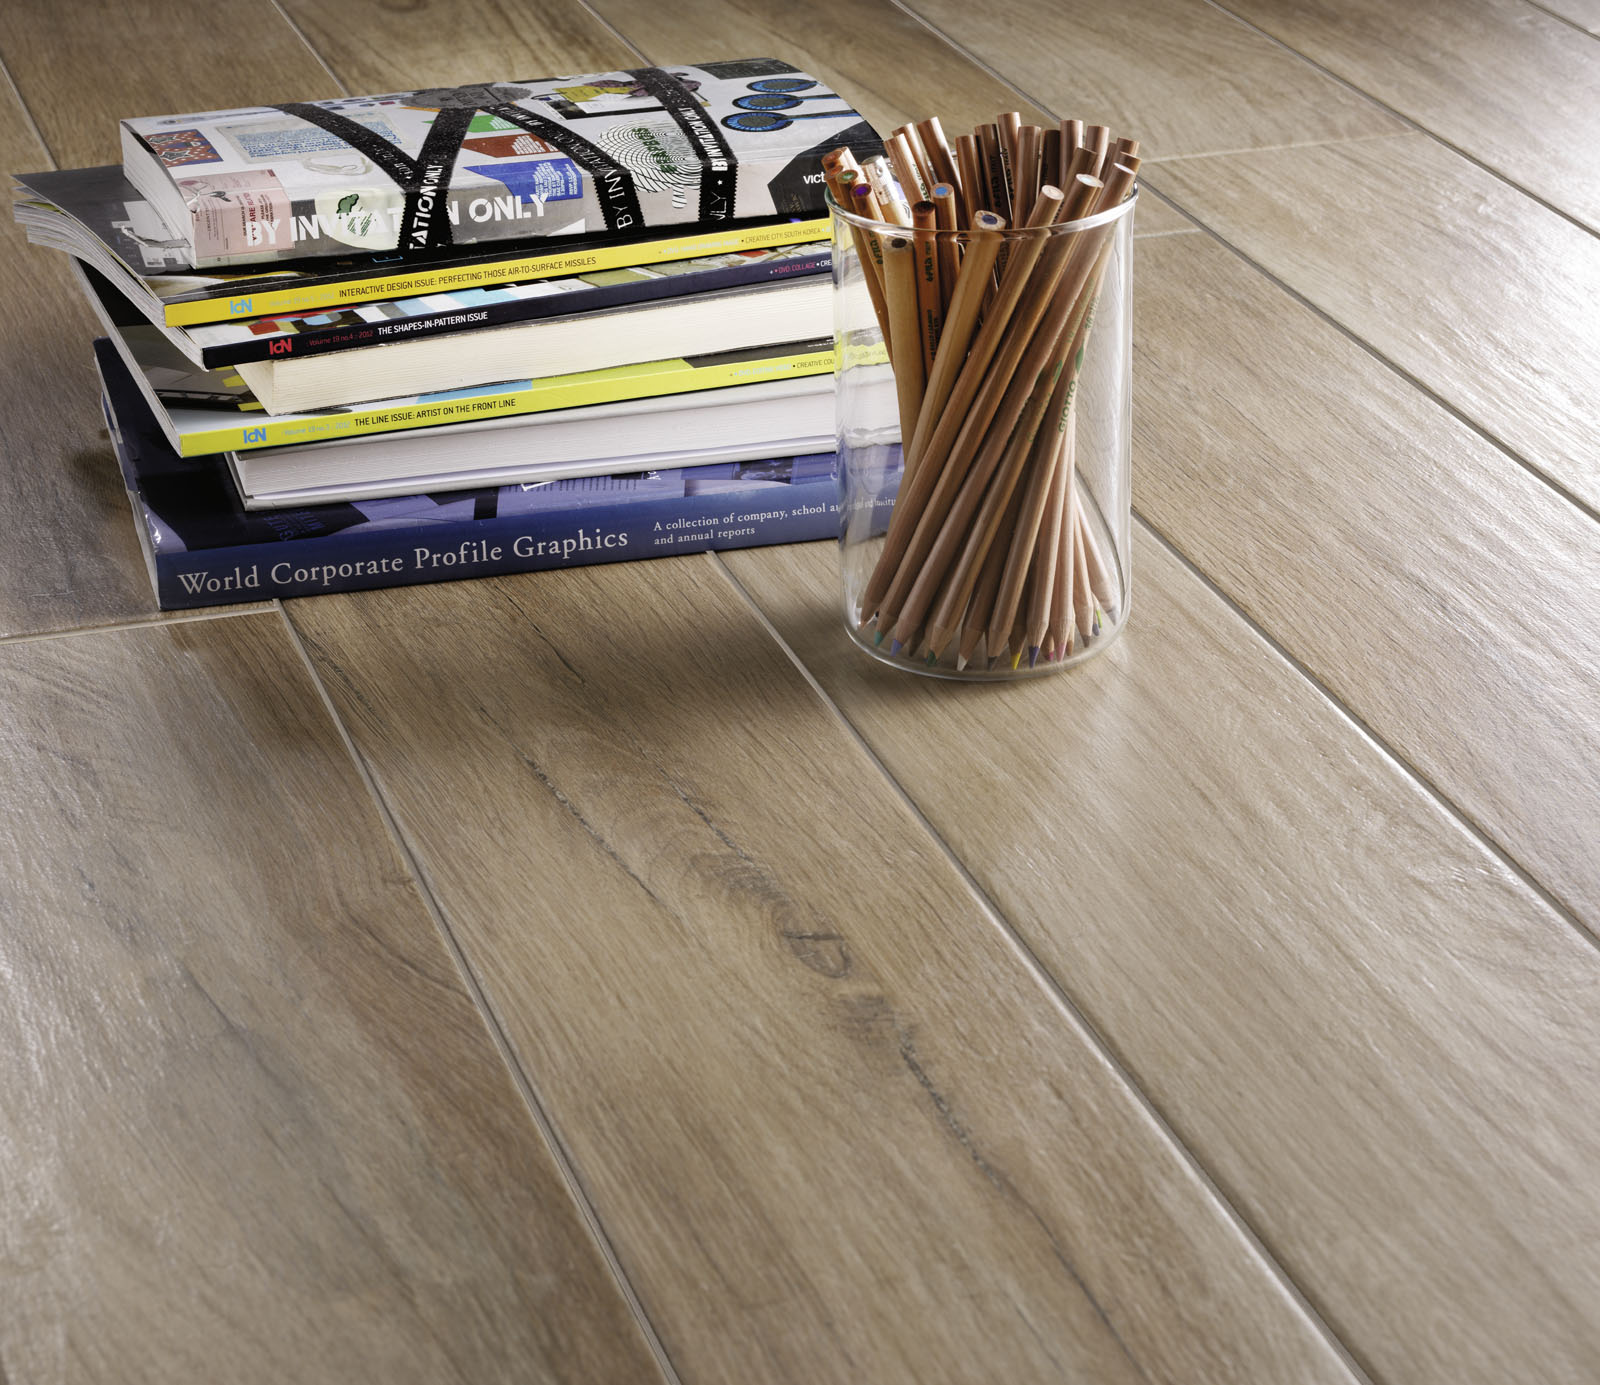 Carrelage Design nettoyage carrelage gres cerame : Carrelage imitation bois et parquet : Marazzi